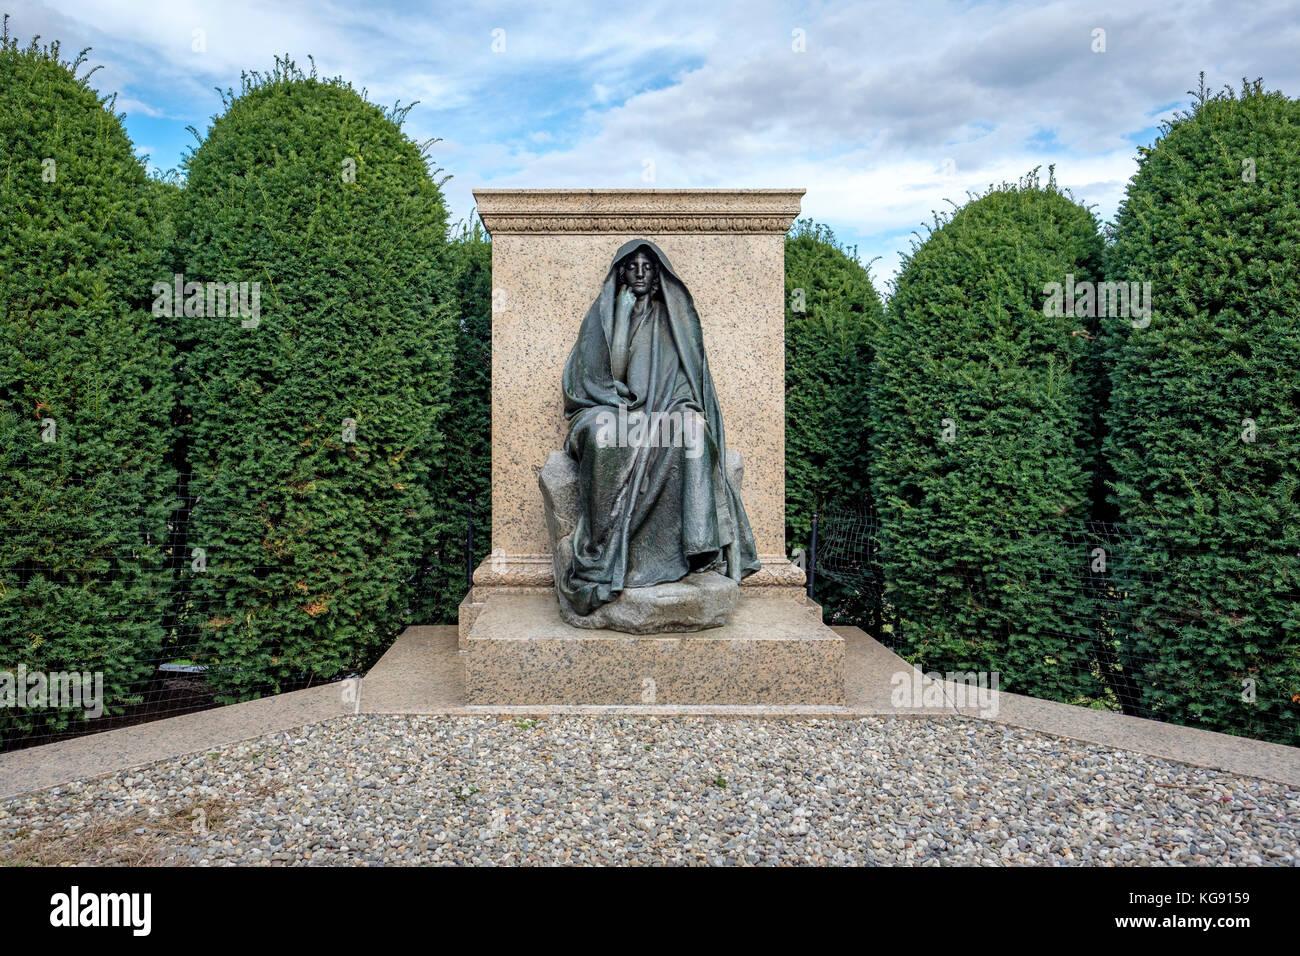 The Adams Memorial, bronze sculpture, American artist Augustus Saint-Gaudens, at Rock Creek Cemetery in Washington, Stock Photo